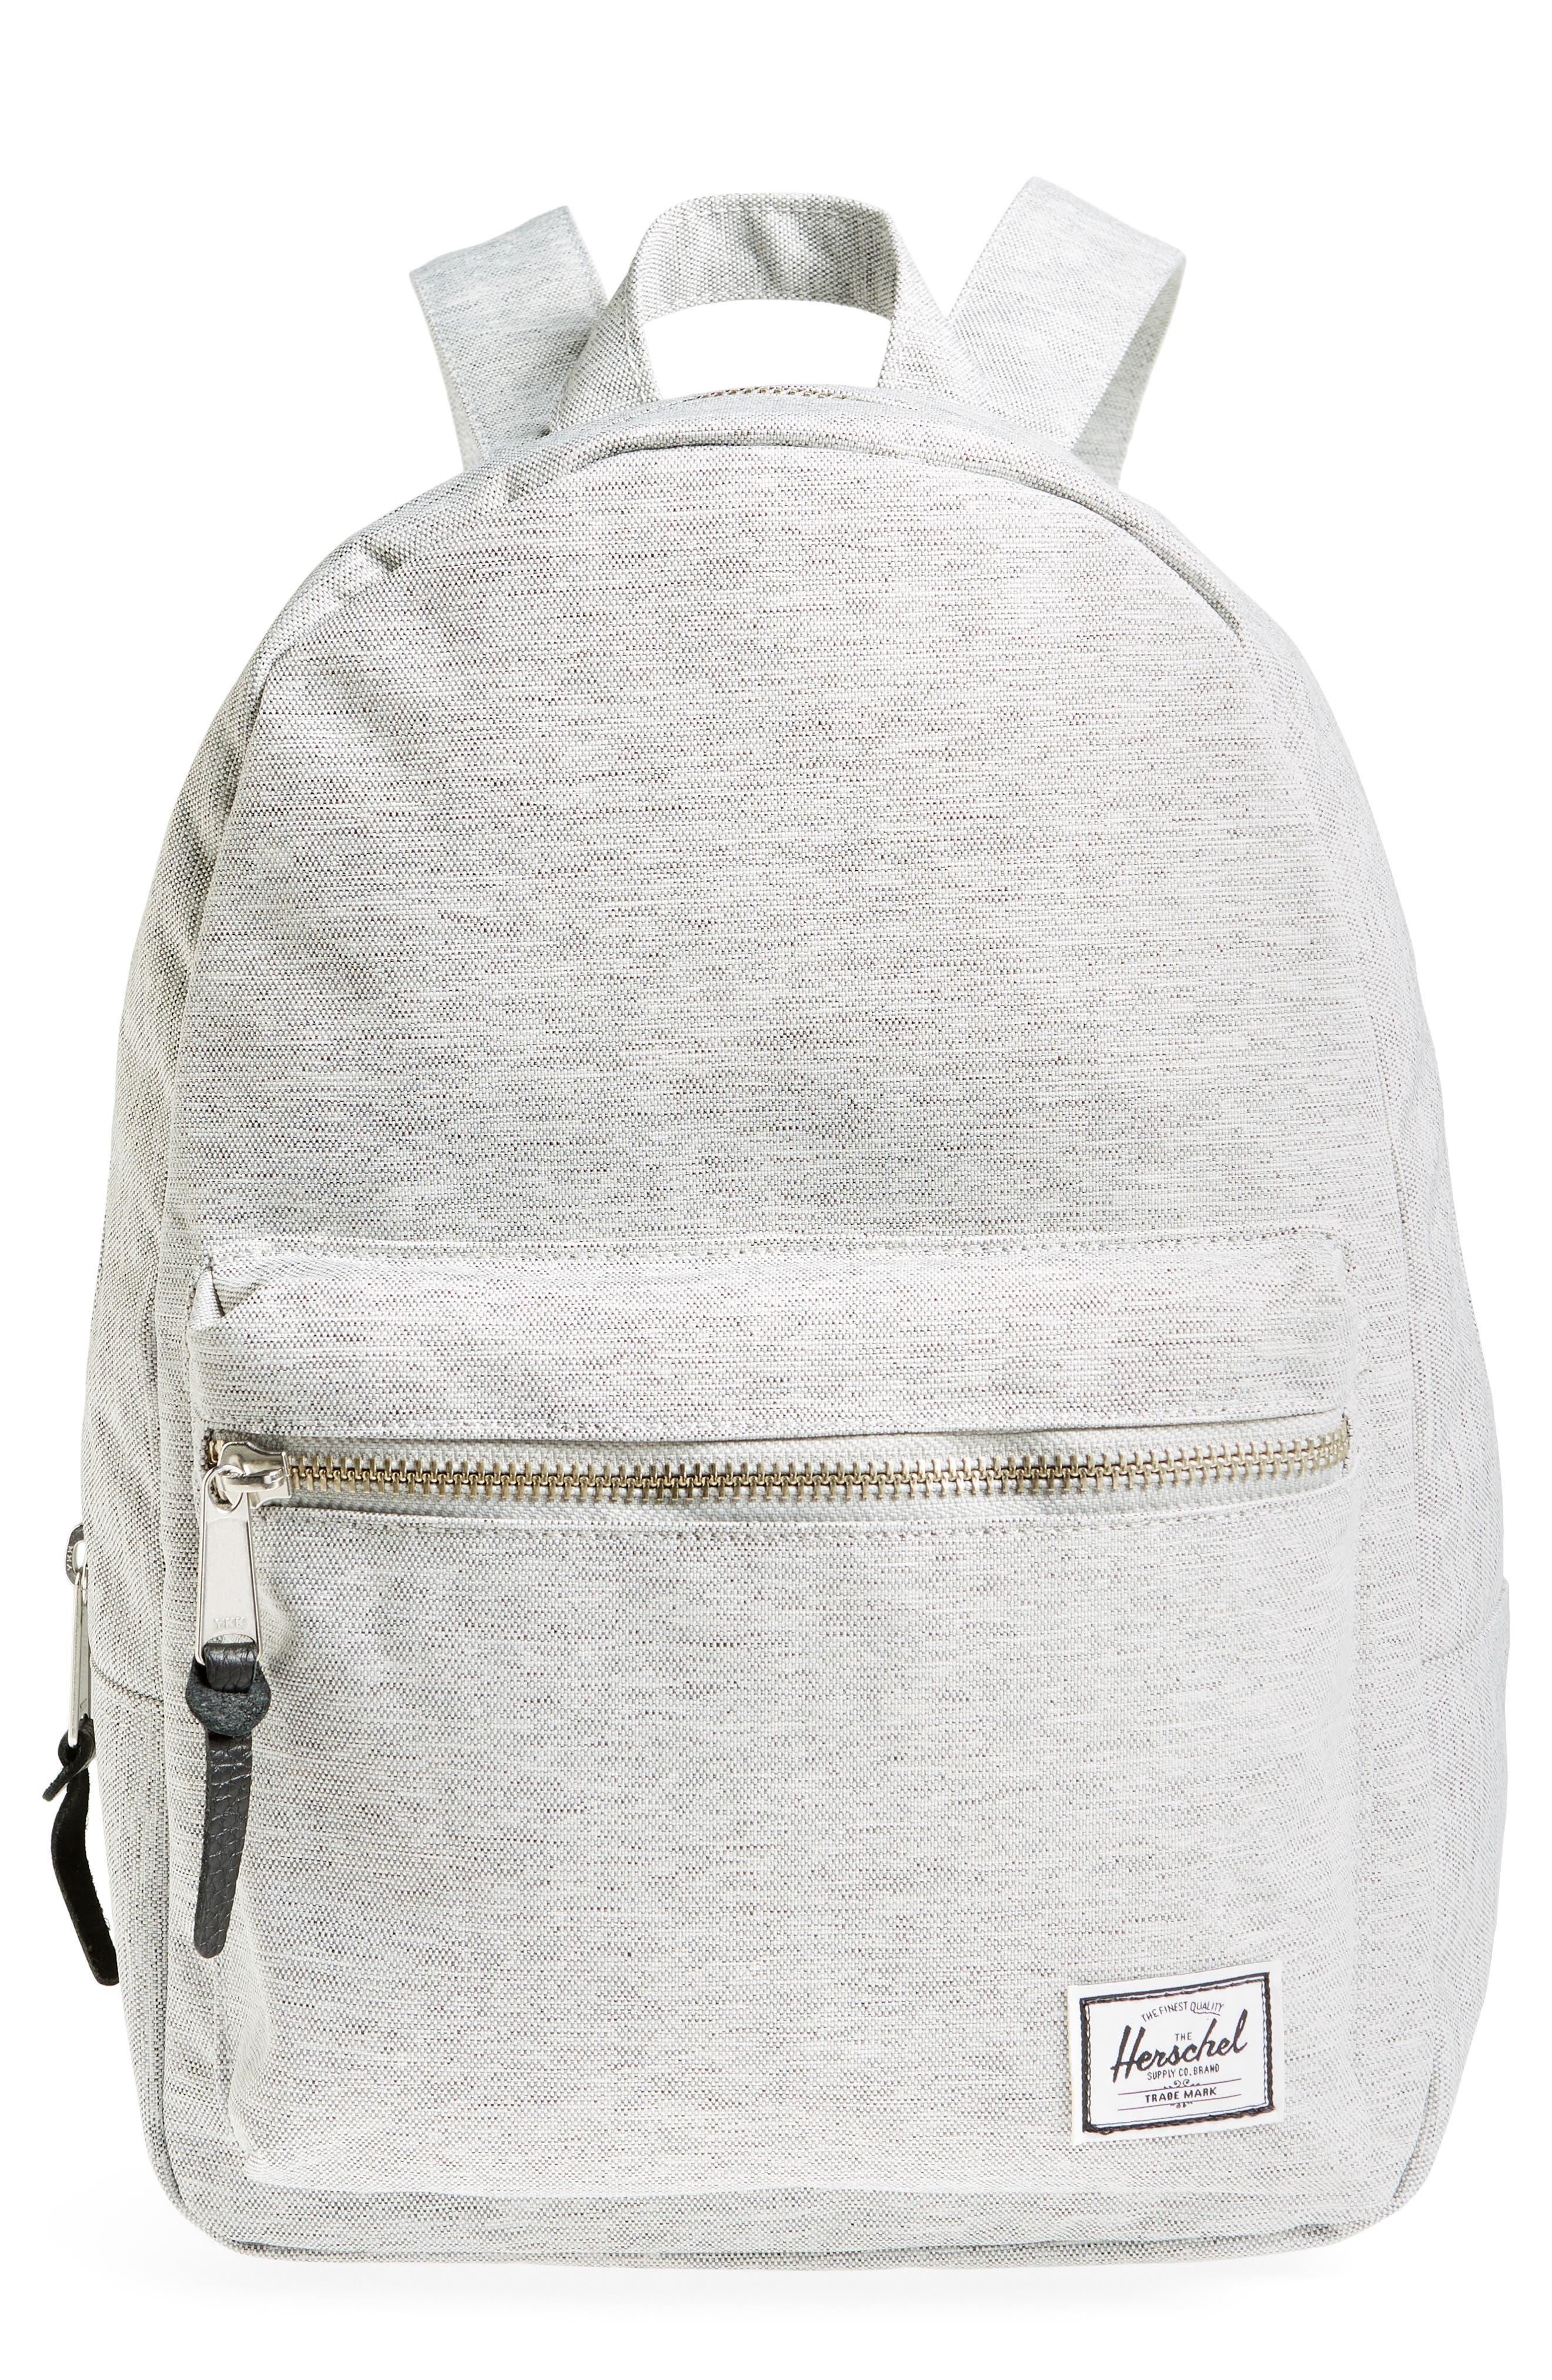 Grove Backpack,                             Main thumbnail 1, color,                             LIGHT GREY CROSSHATCH